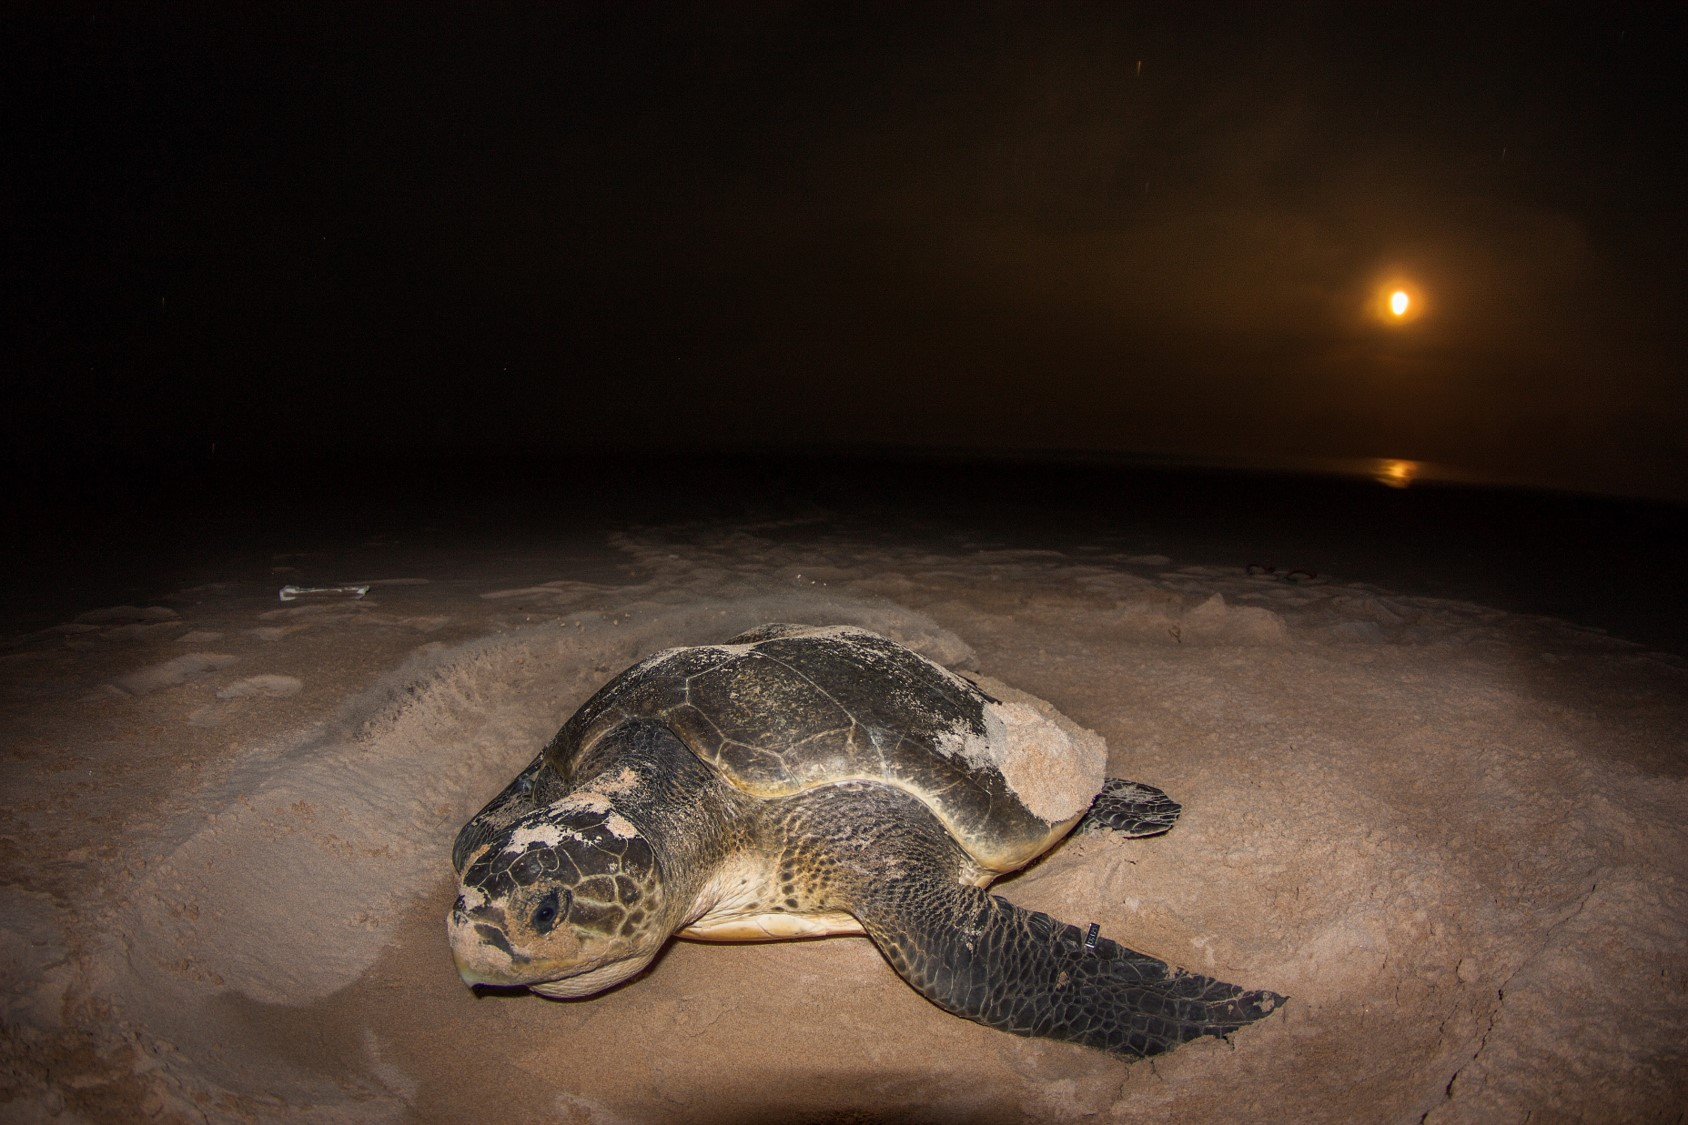 ii/ A nesting turtle